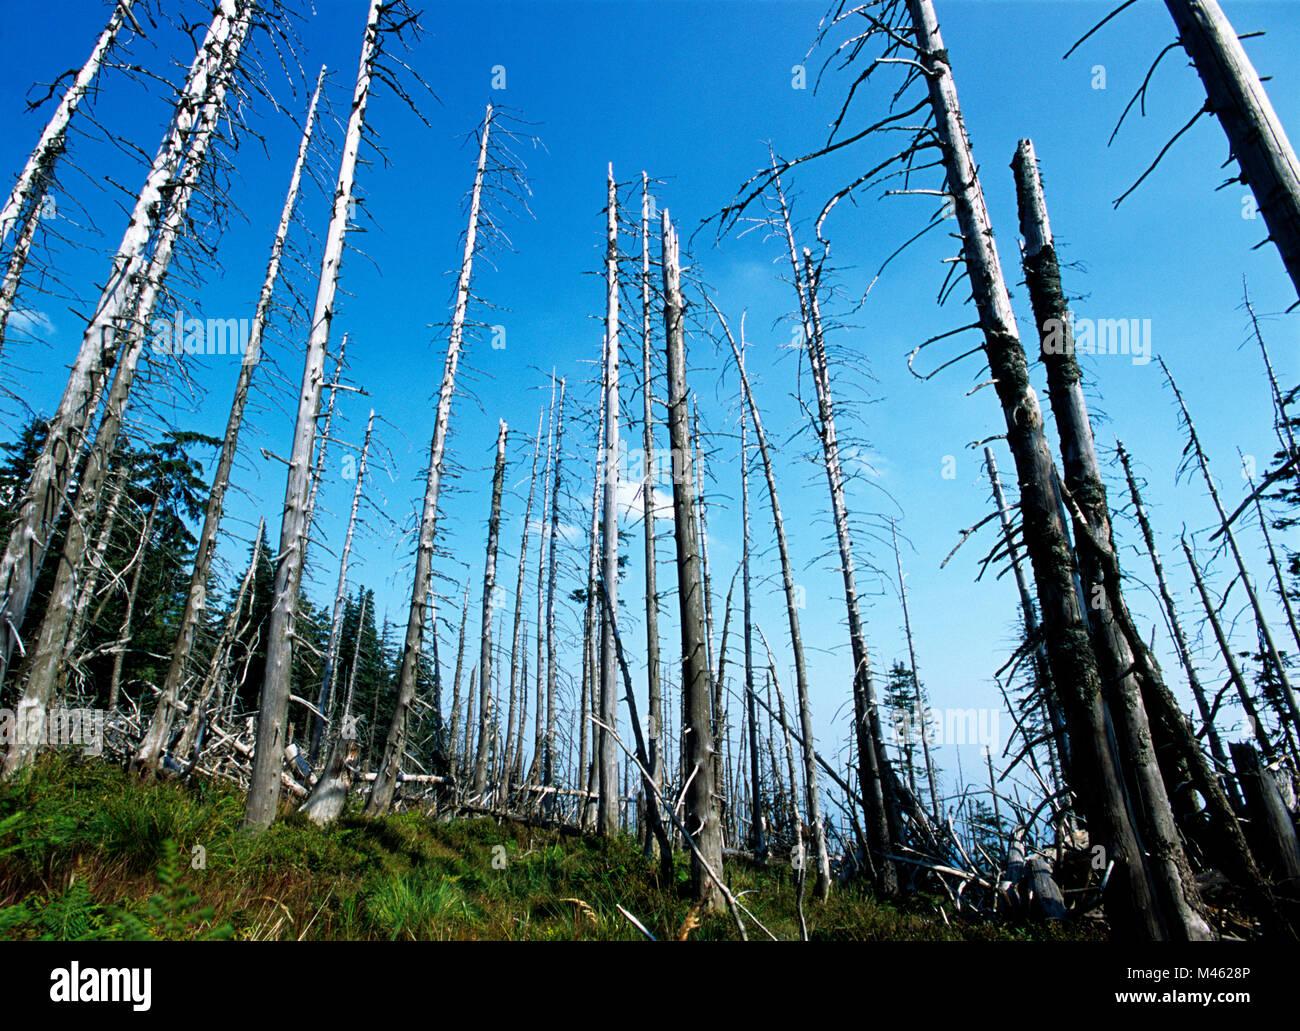 hight resolution of acid rain damaged pine trees in the karkonosze national park in silesia poland 2002